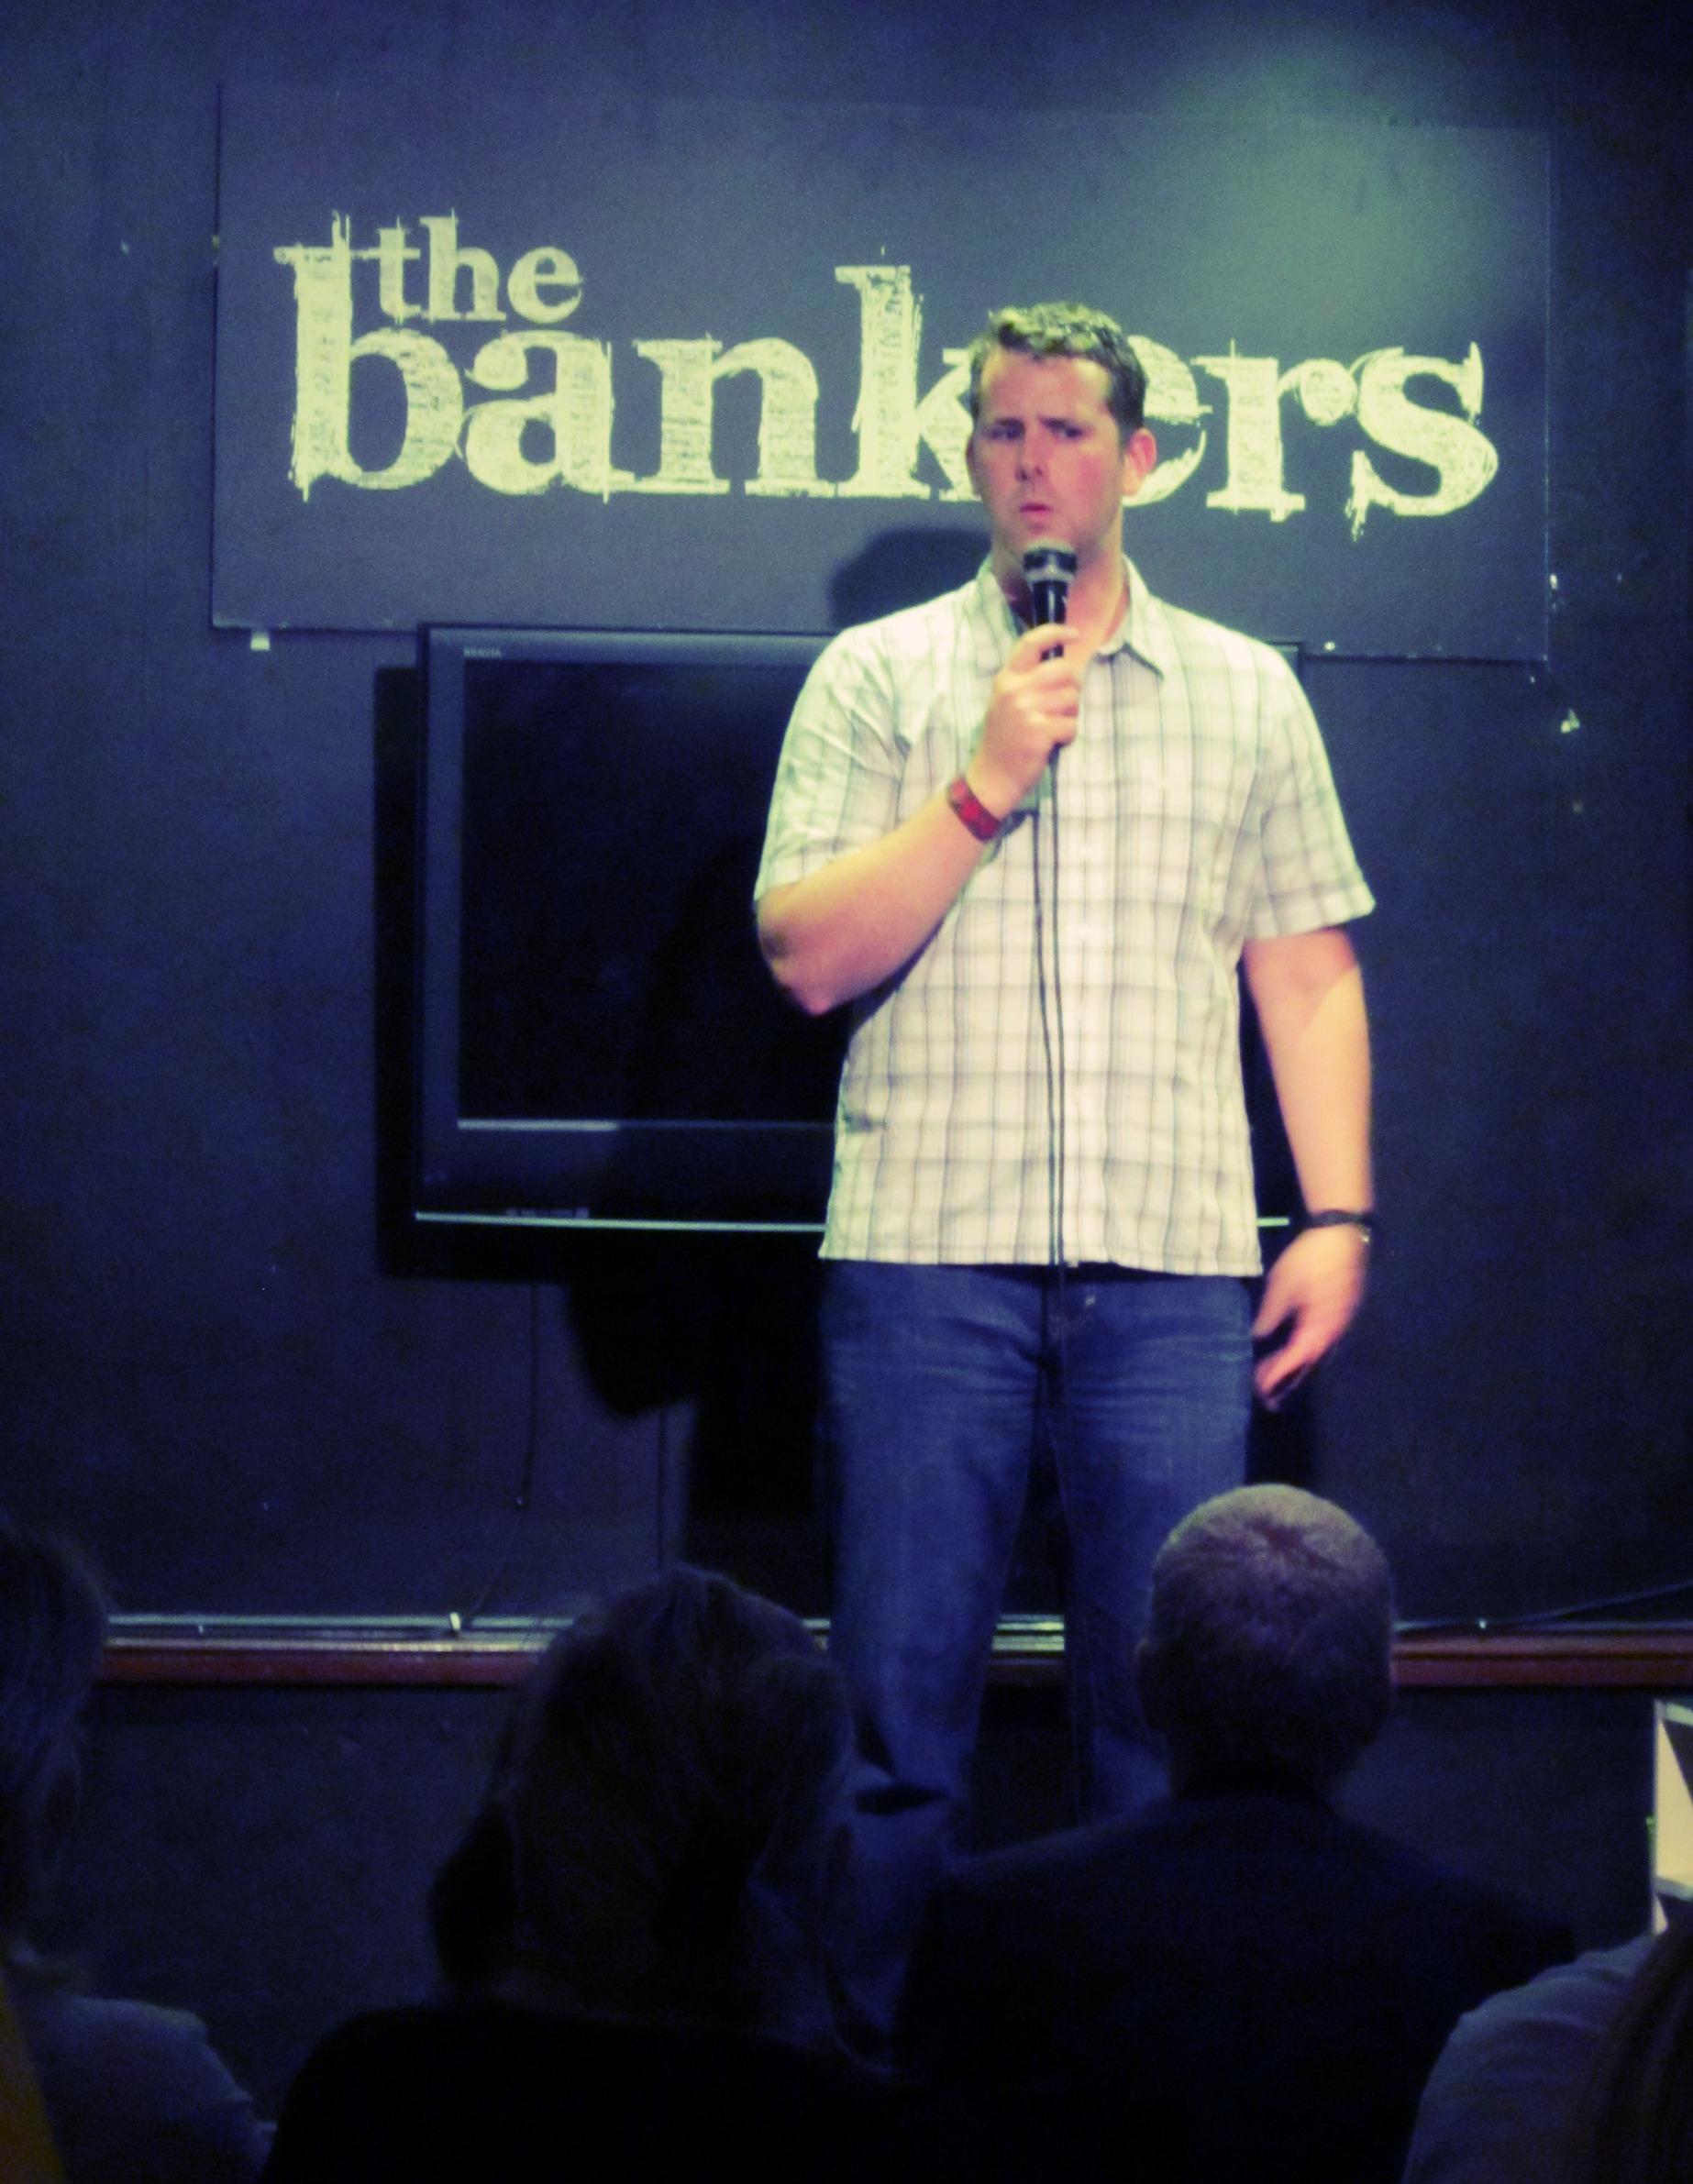 Bankers Dublin2 82013